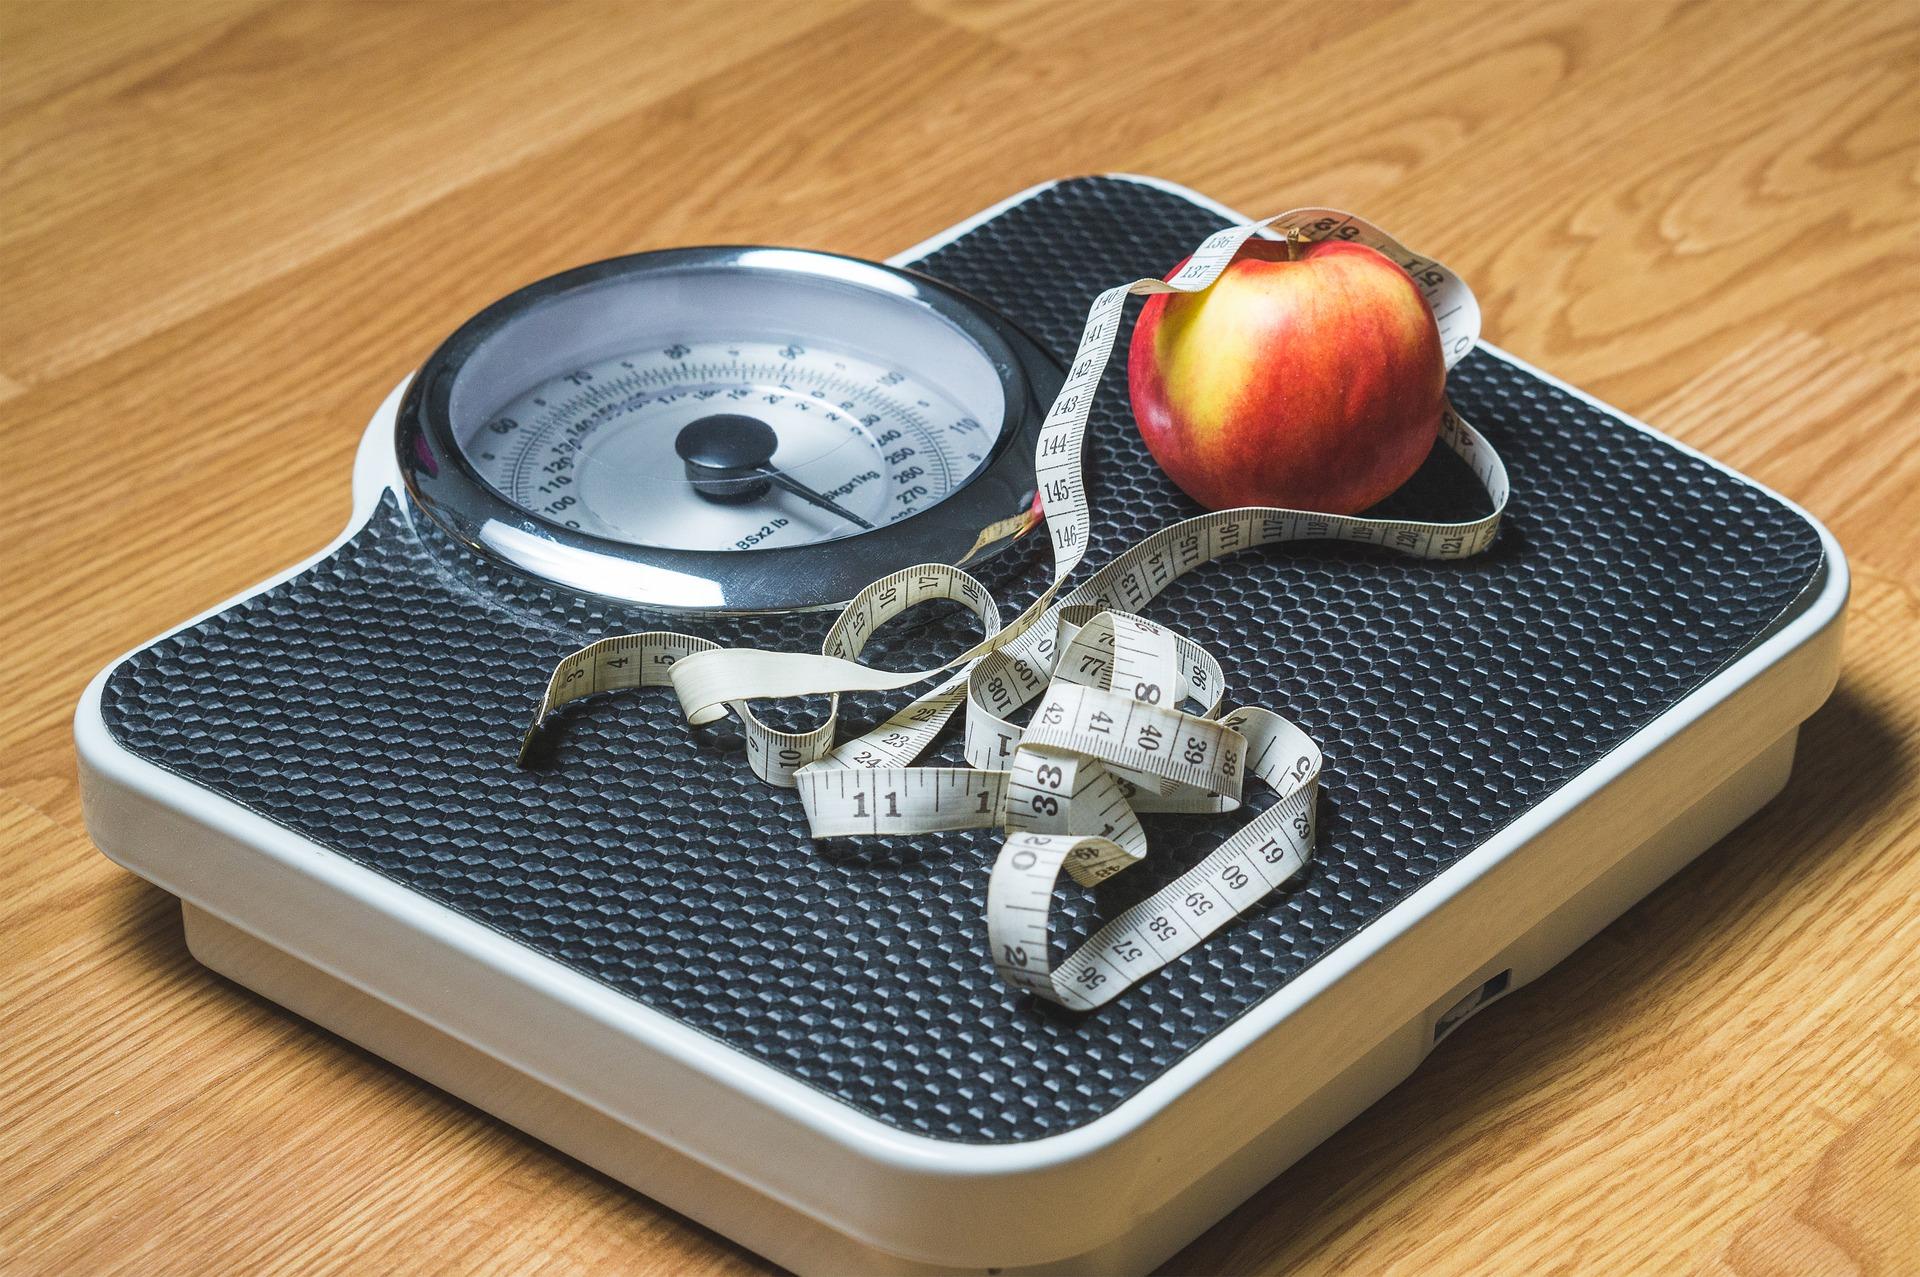 weight-loss-2036969_1920.jpg